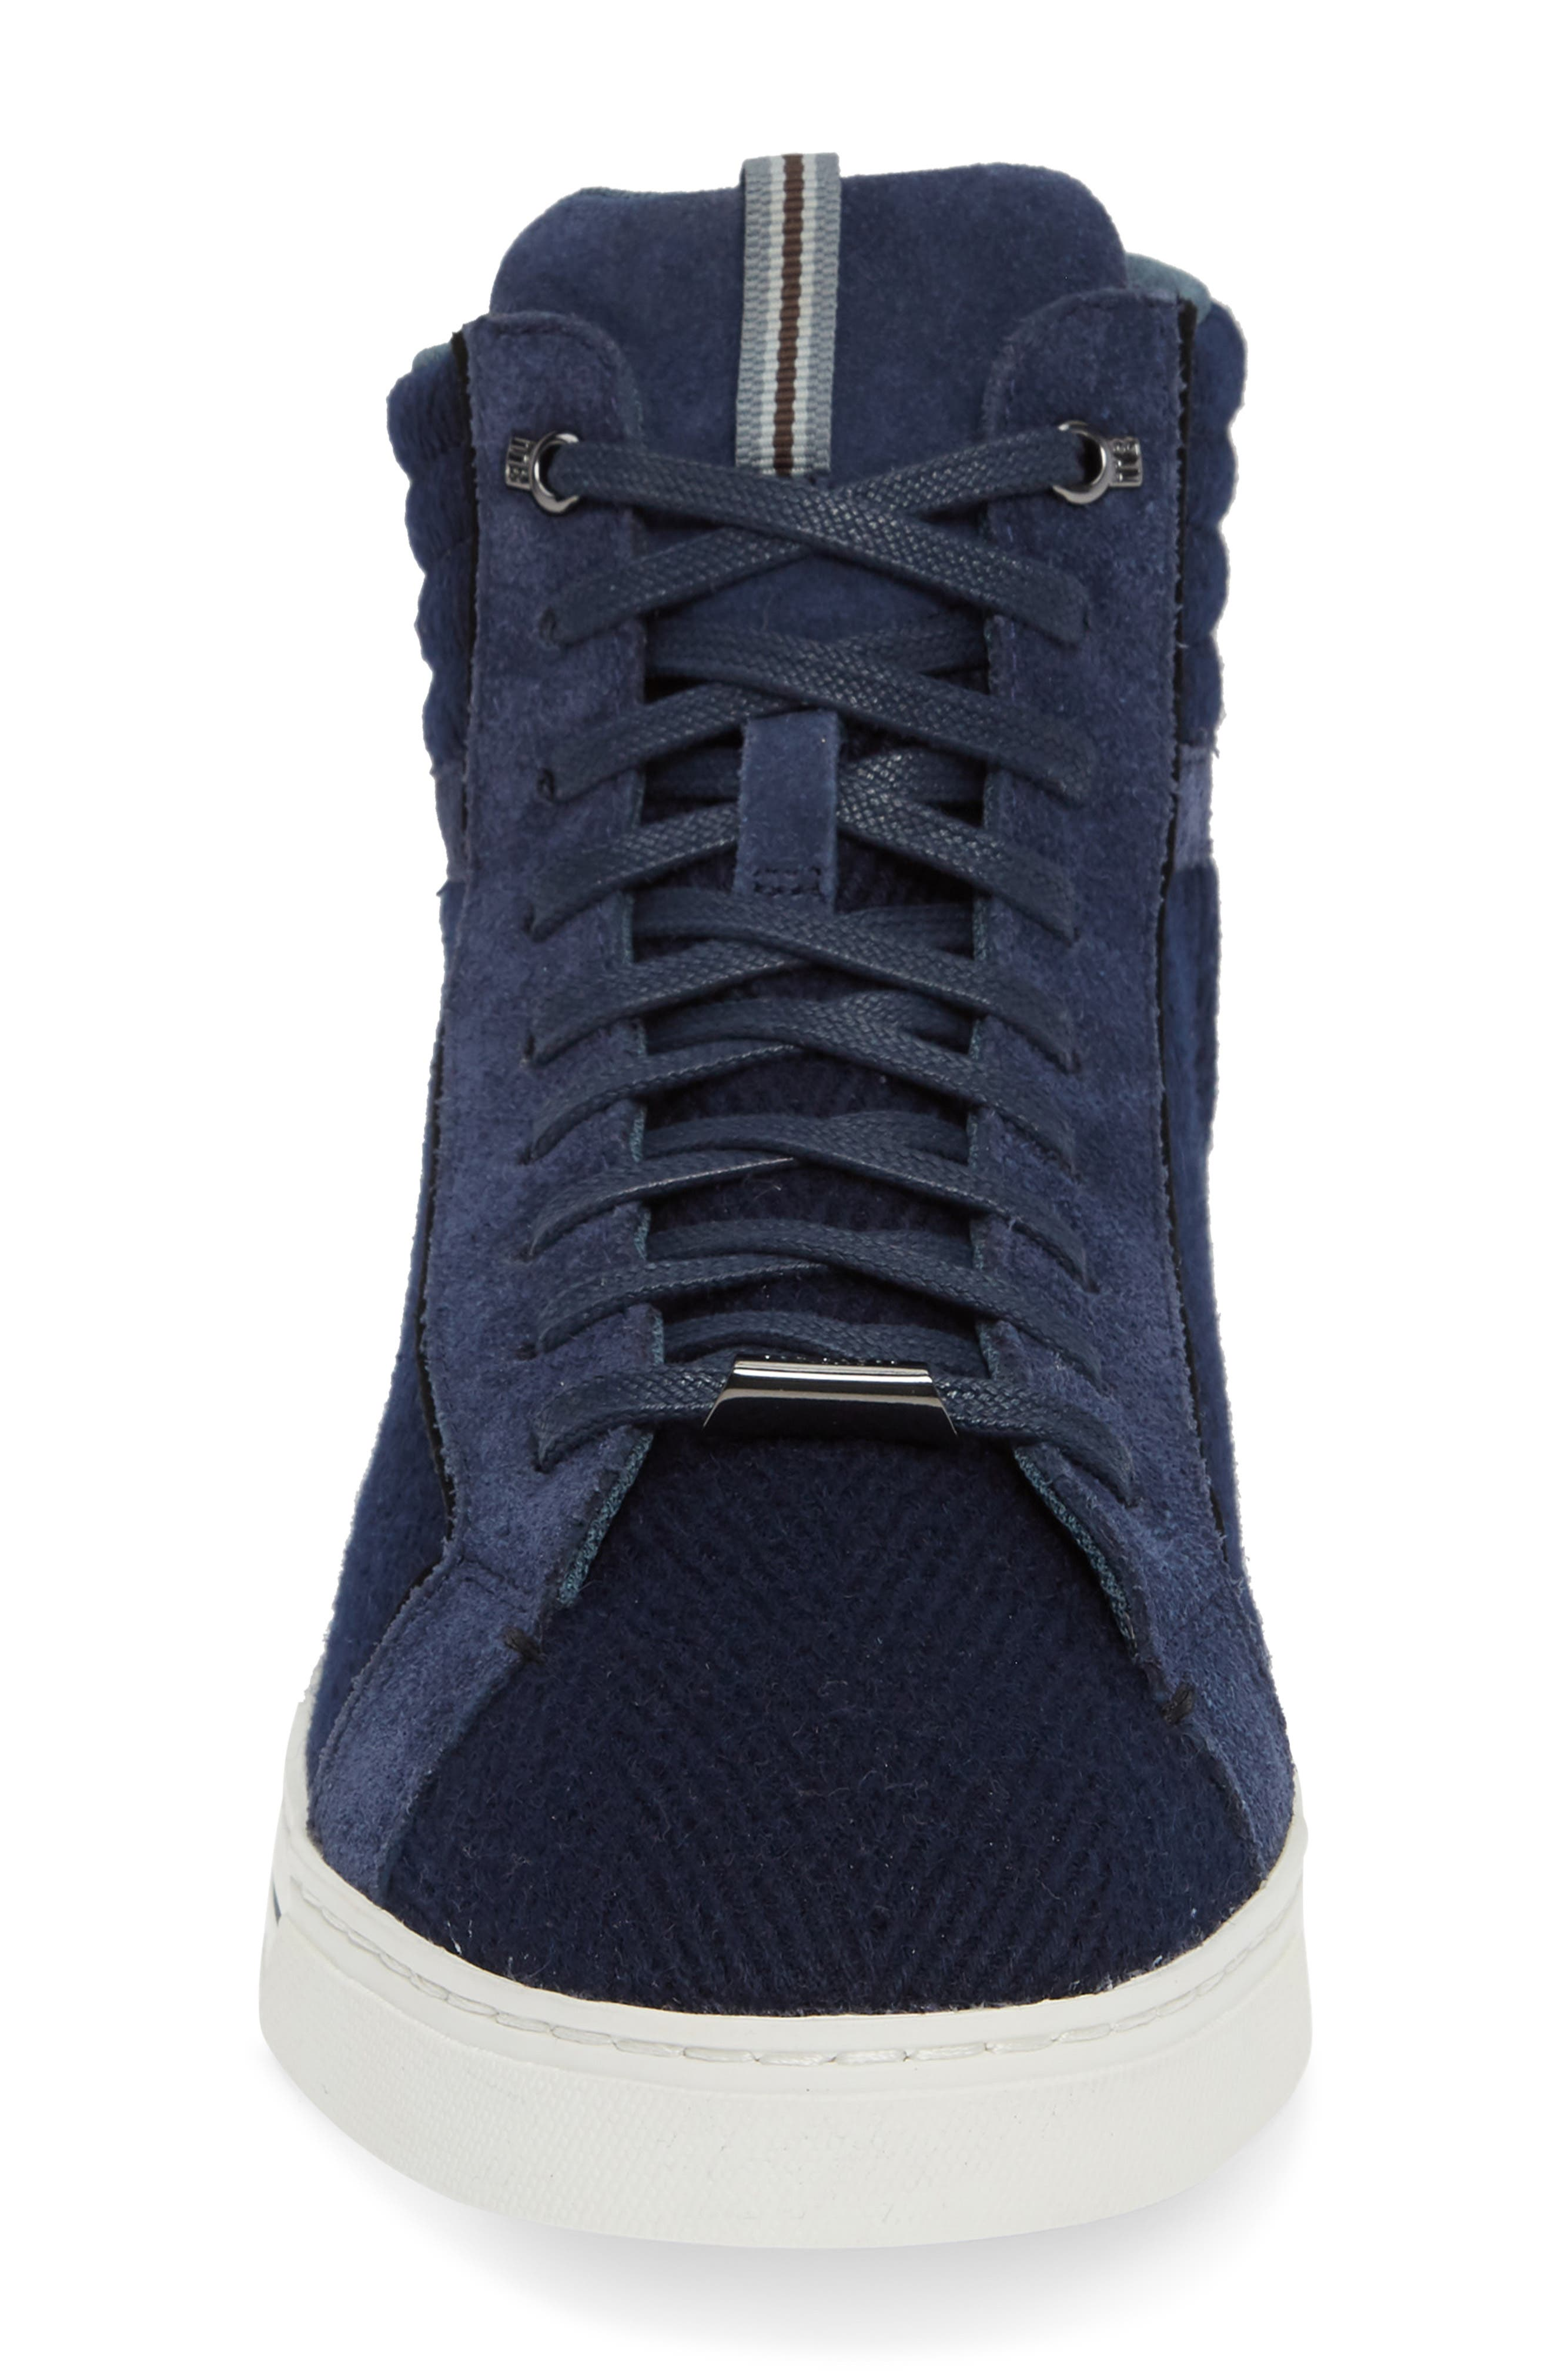 Luckan High Top Sneaker,                             Alternate thumbnail 4, color,                             DARK BLUE FABRIC